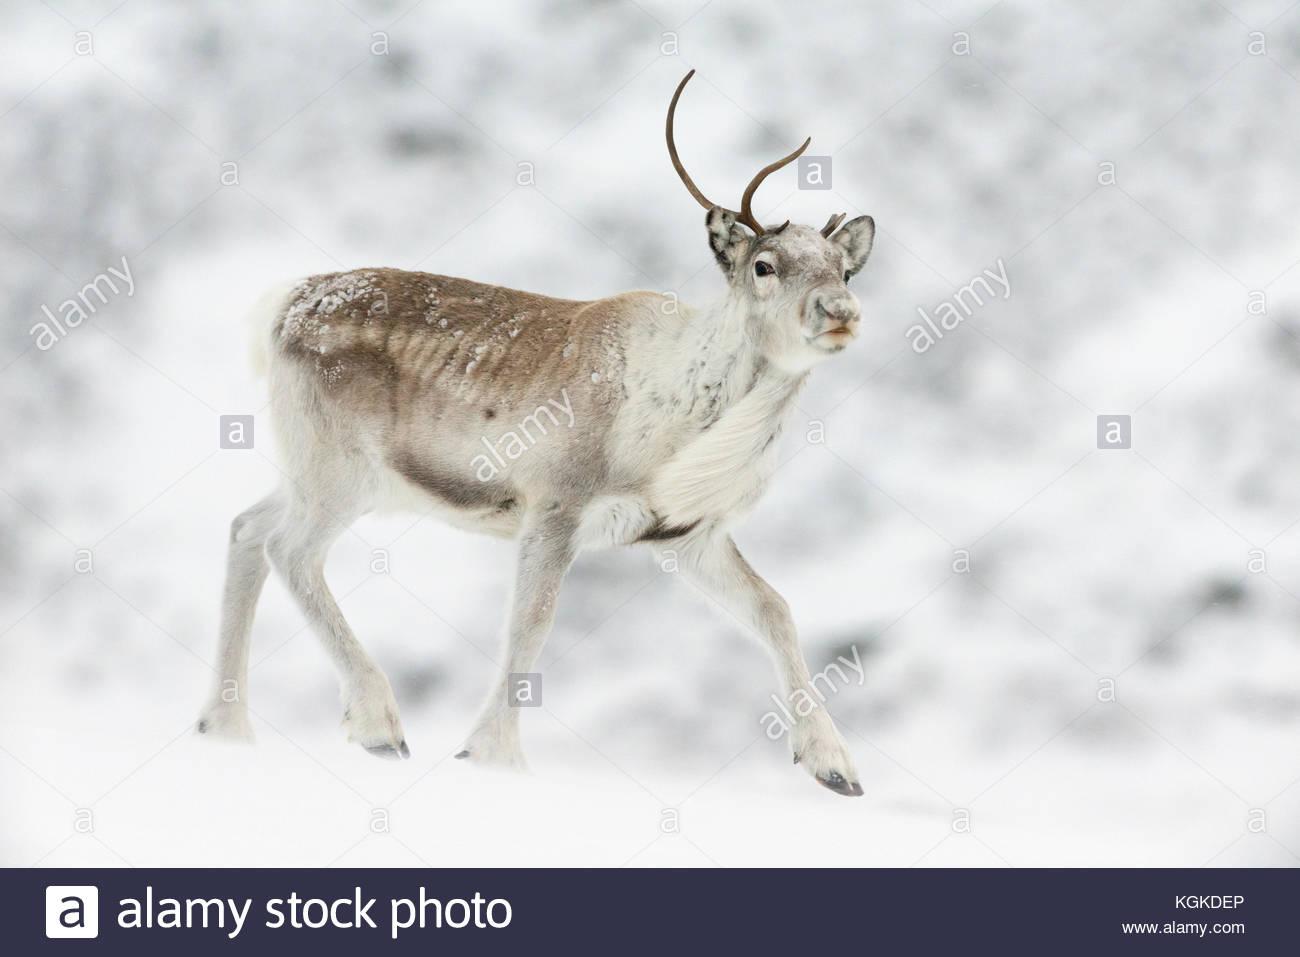 Semi-domesticated Reindeer, Rangifer tarandus, in snow. - Stock Image